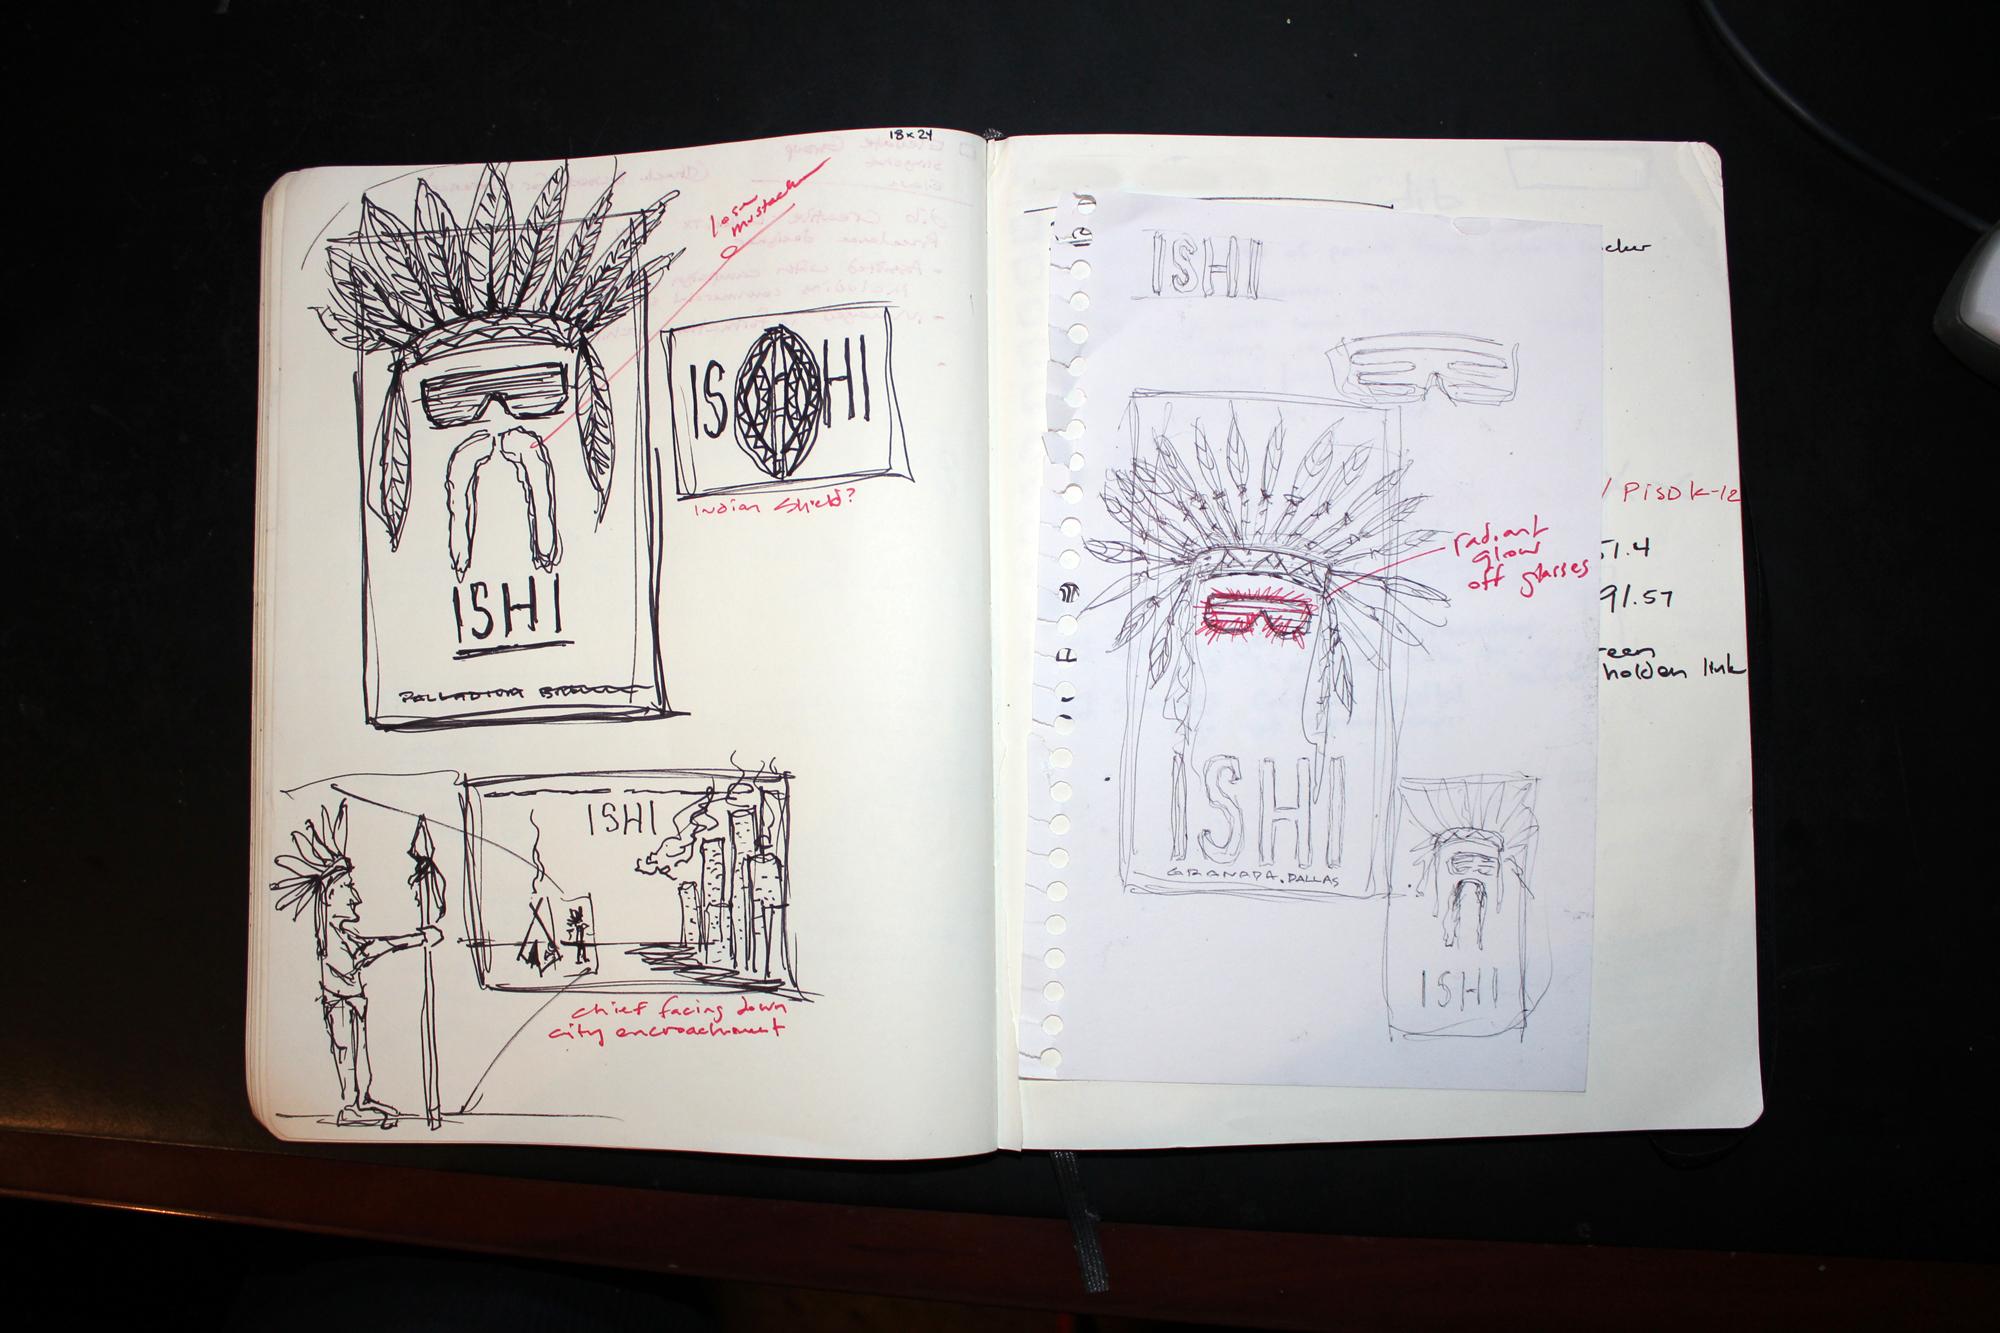 ISHI - image 4 - student project